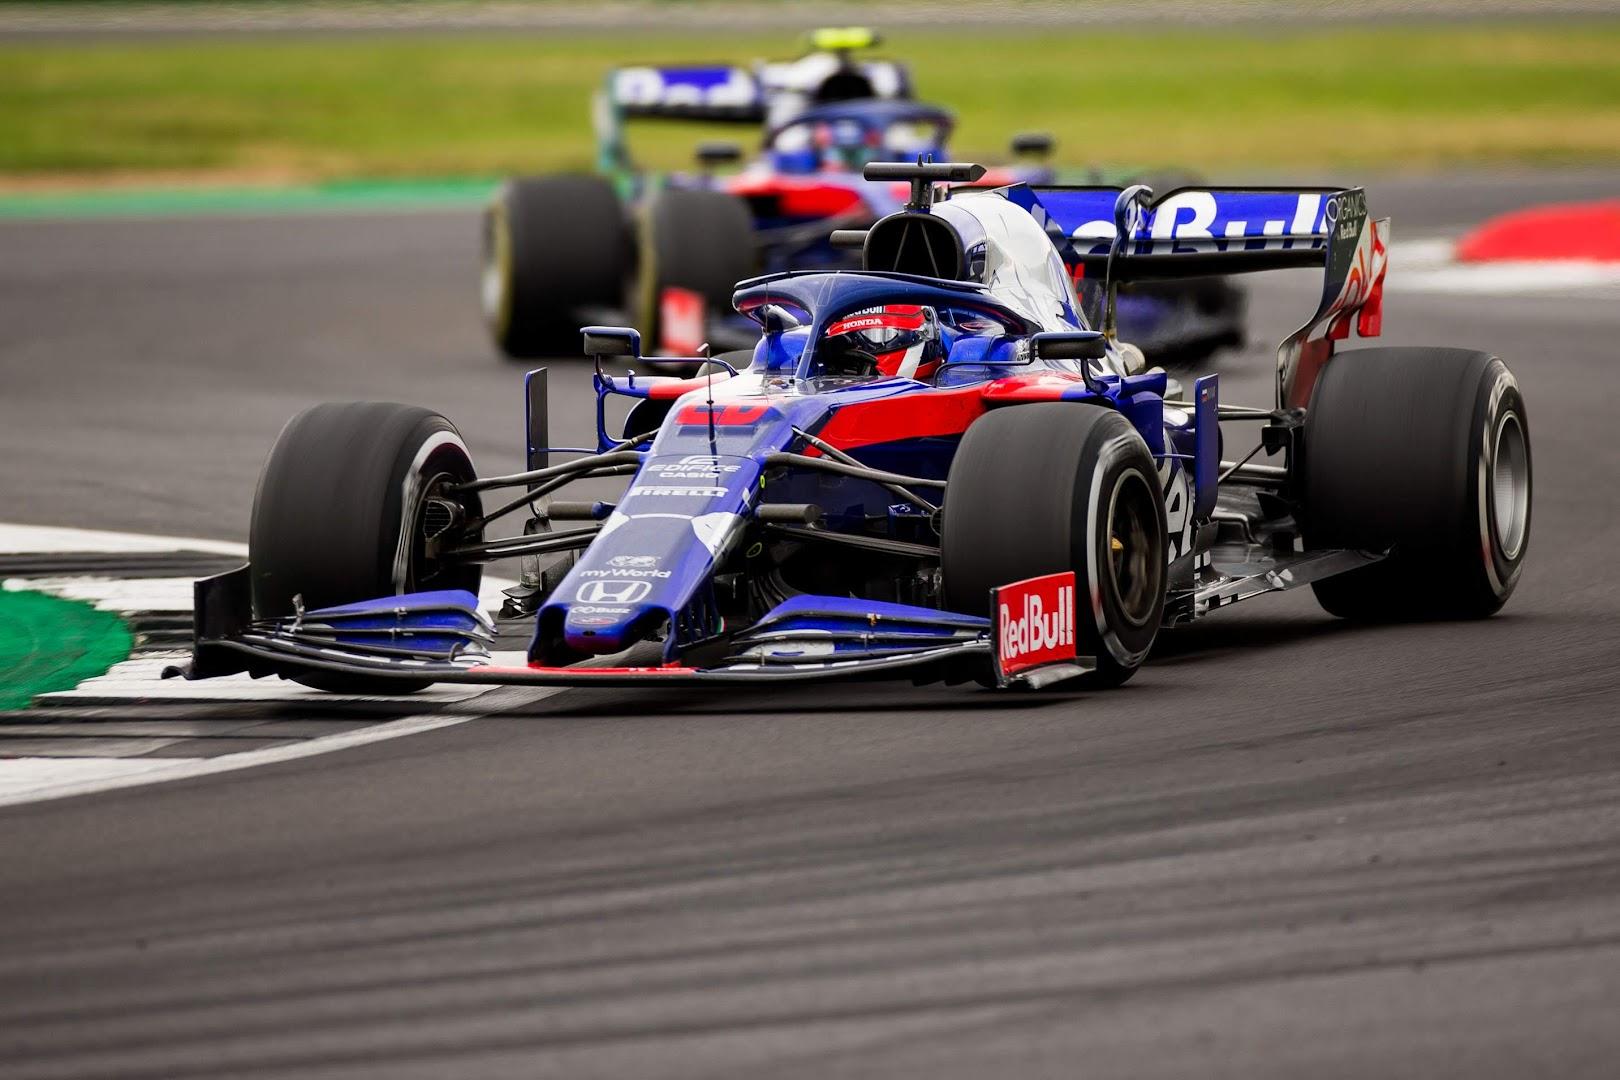 F1第10戦イギリスGP、トロロッソ・ホンダ2台